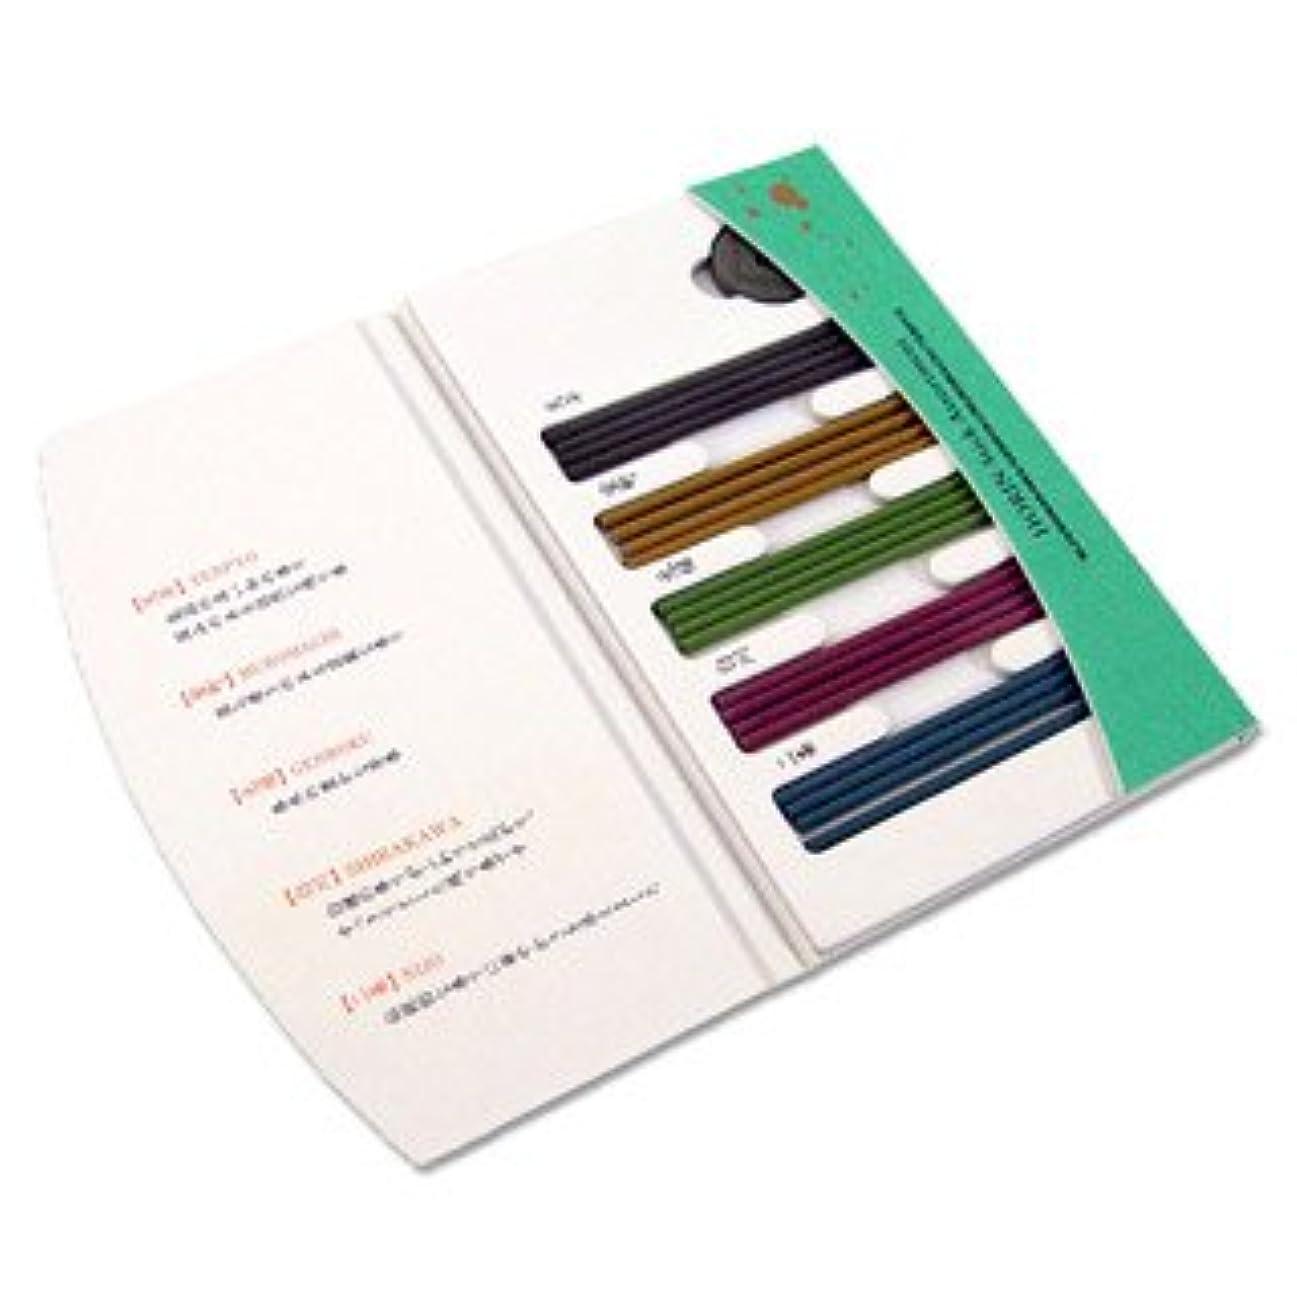 Shoyeido's Horin Incense Assortment - 20 Sticks, New.